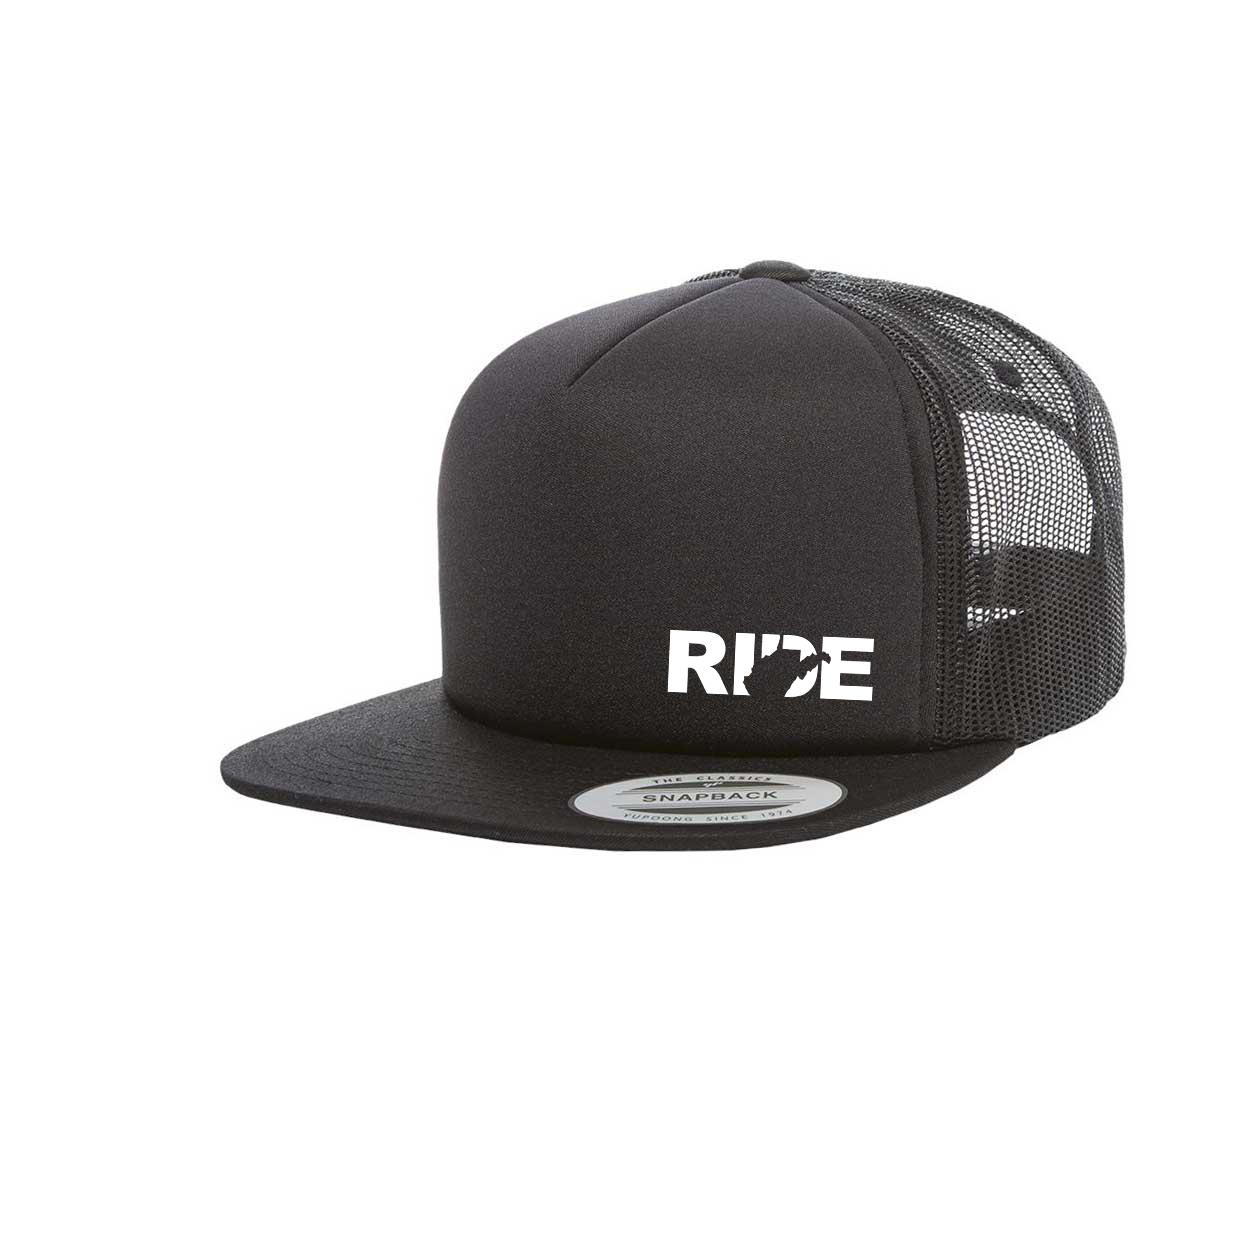 Ride West Virginia Night Out Premium Foam Flat Brim Snapback Hat Black (White Logo)